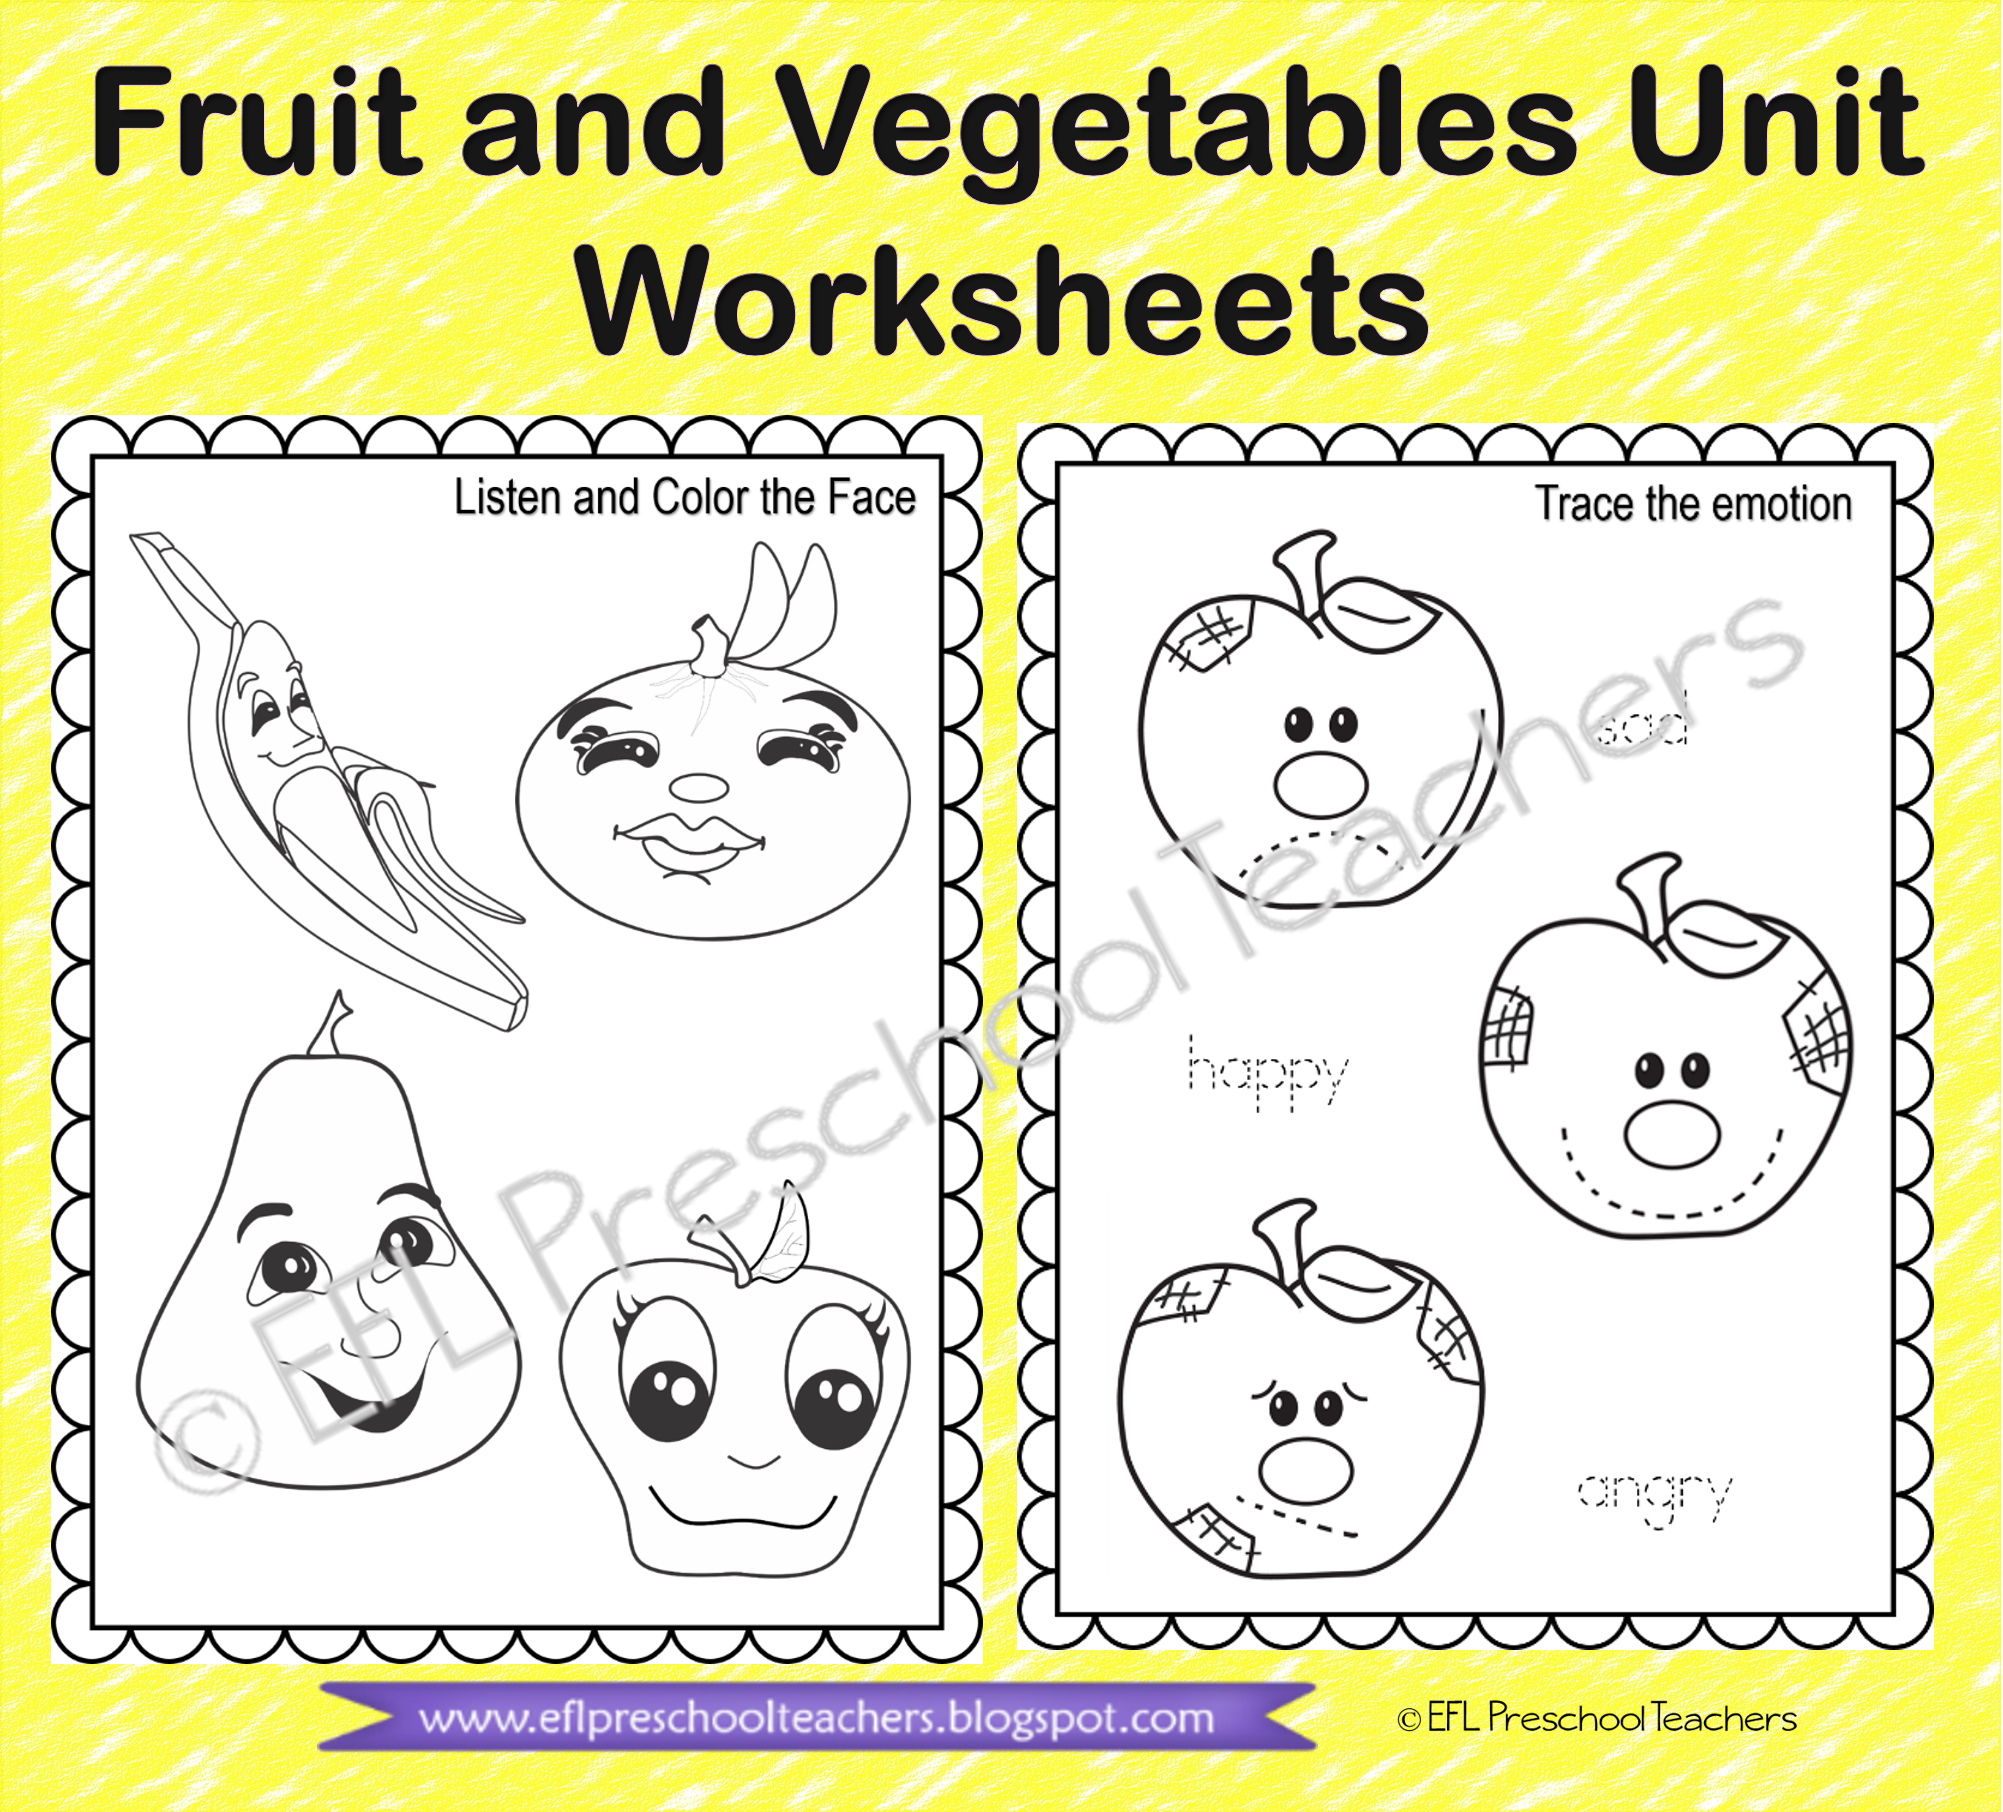 Fruit And Vegetables Theme For Kindergarten Holistic English Resources 10 Fruit English Resources Teachers [ 1812 x 2003 Pixel ]